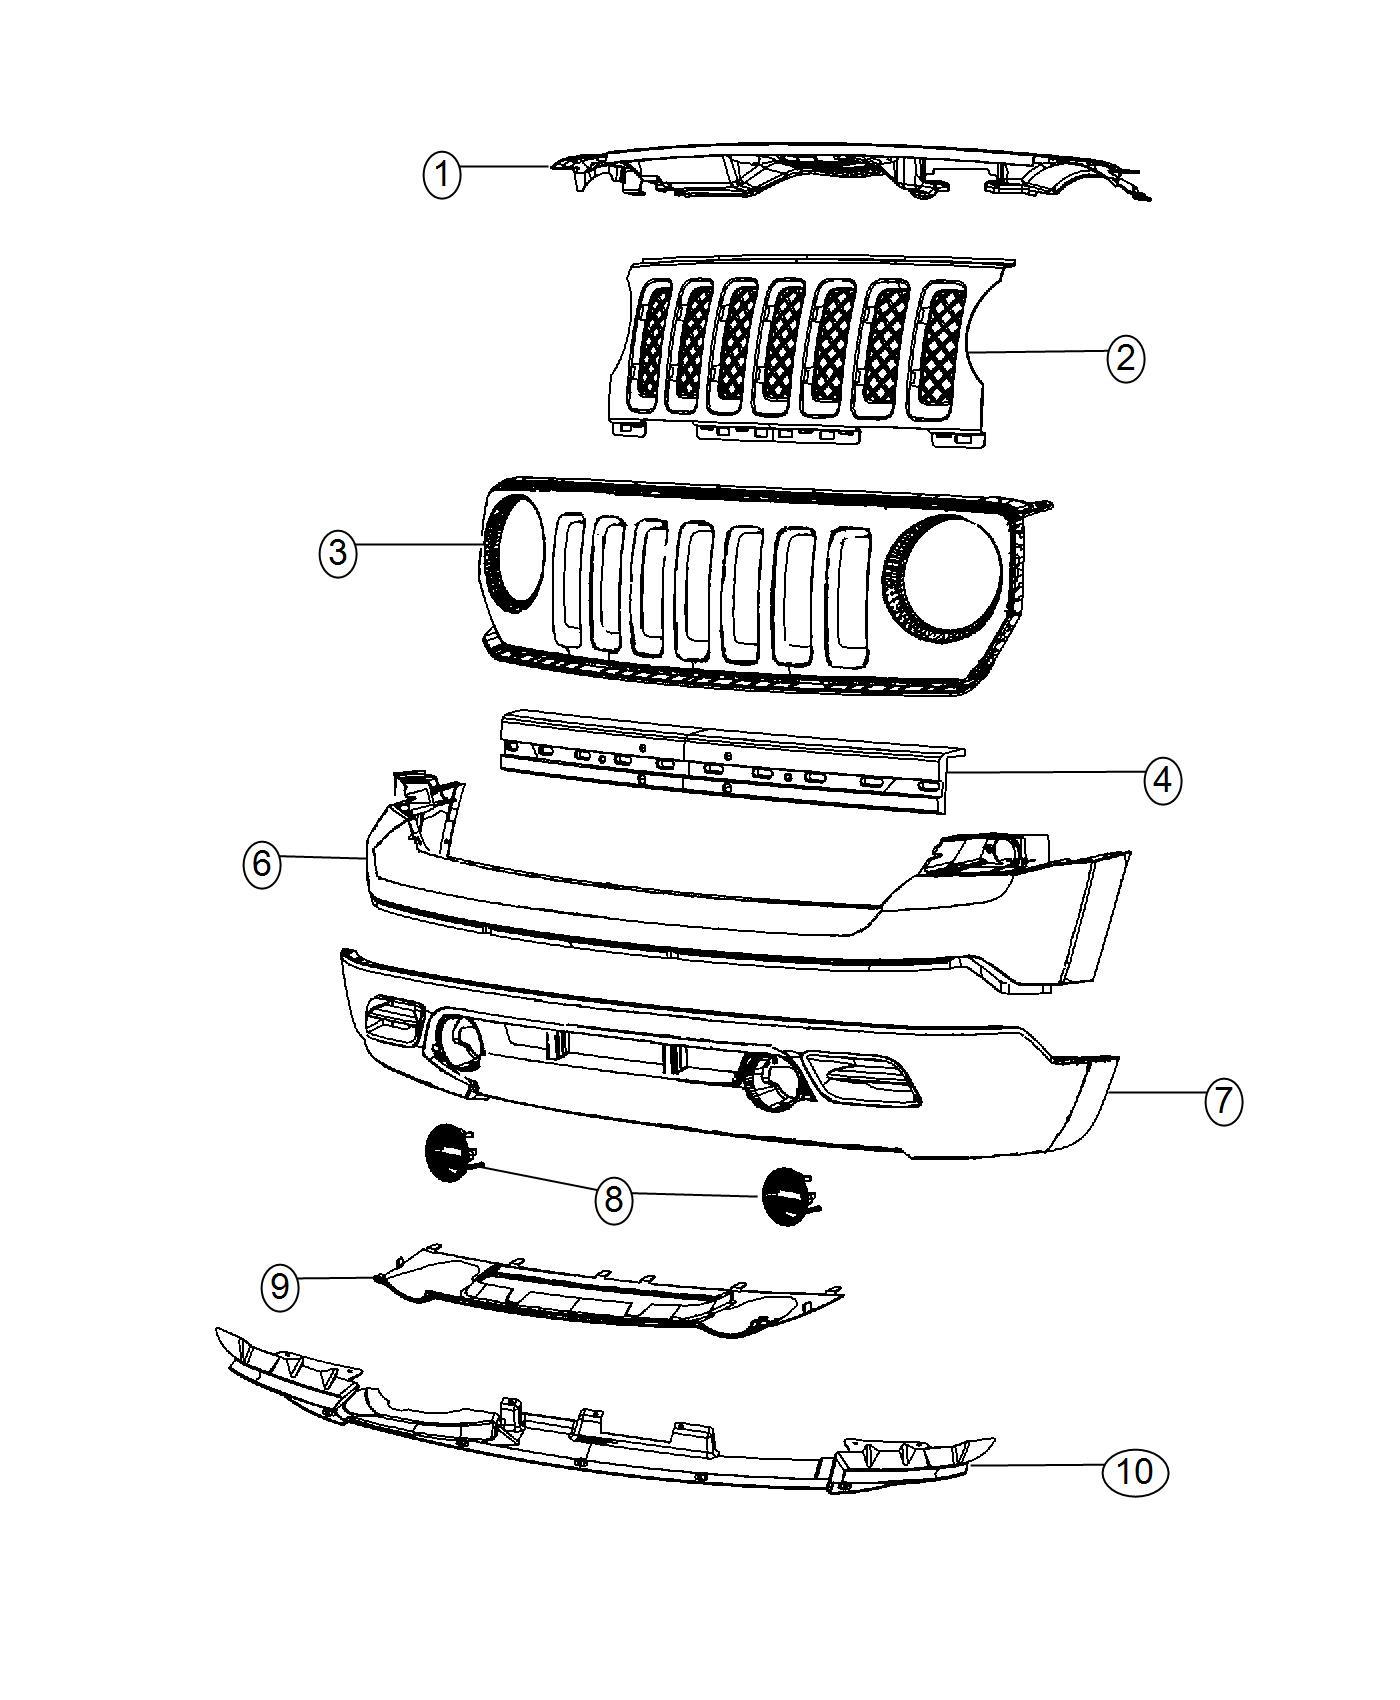 2016 Jeep Patriot Reinforcement. Front bumper. Without